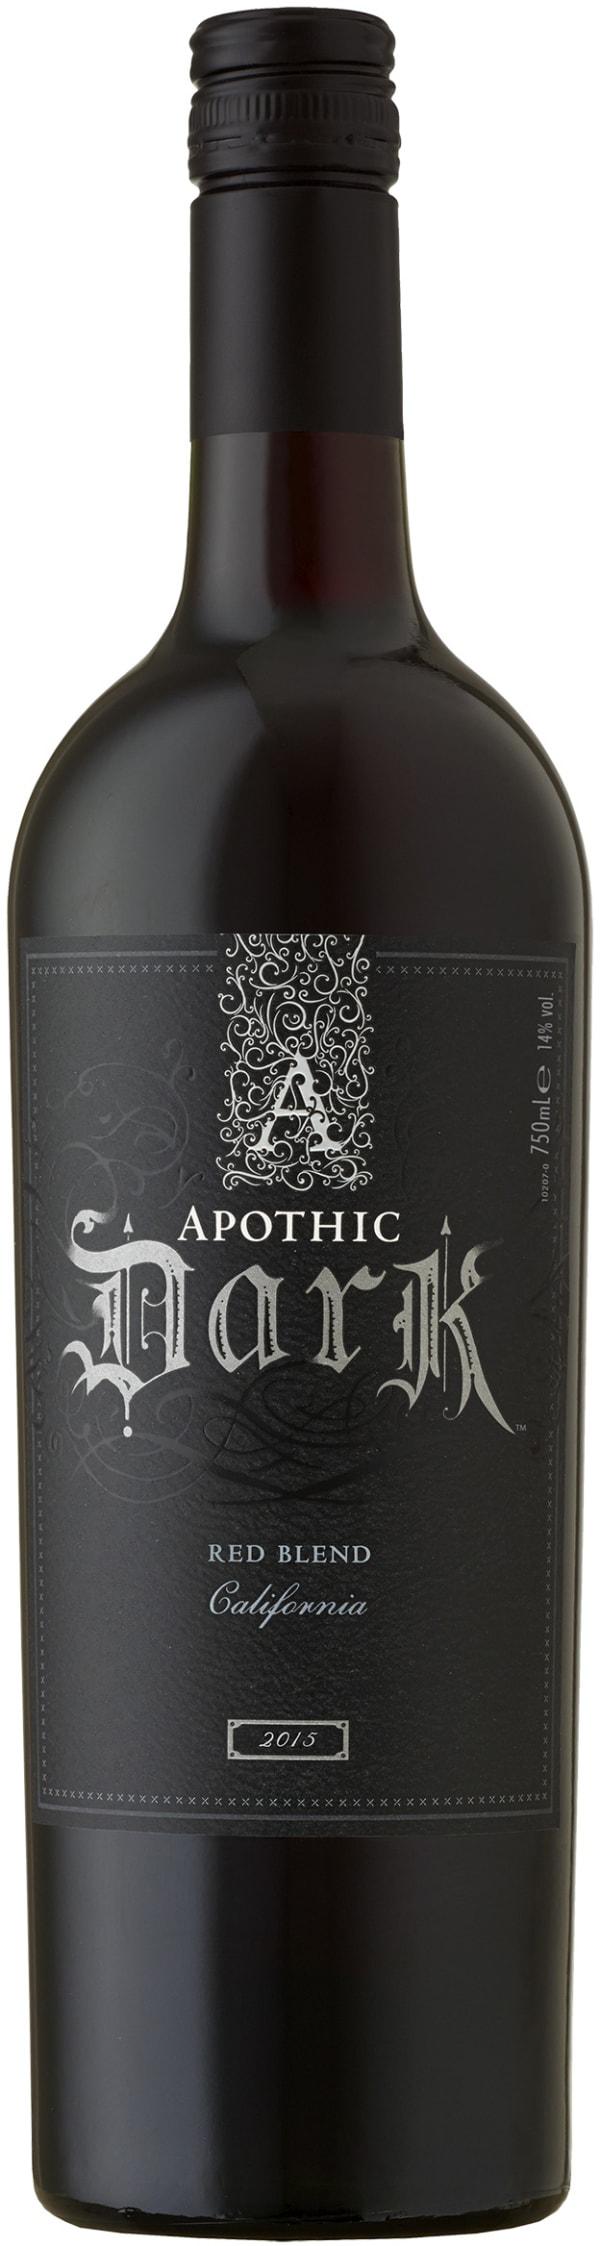 Apothic Dark 2017